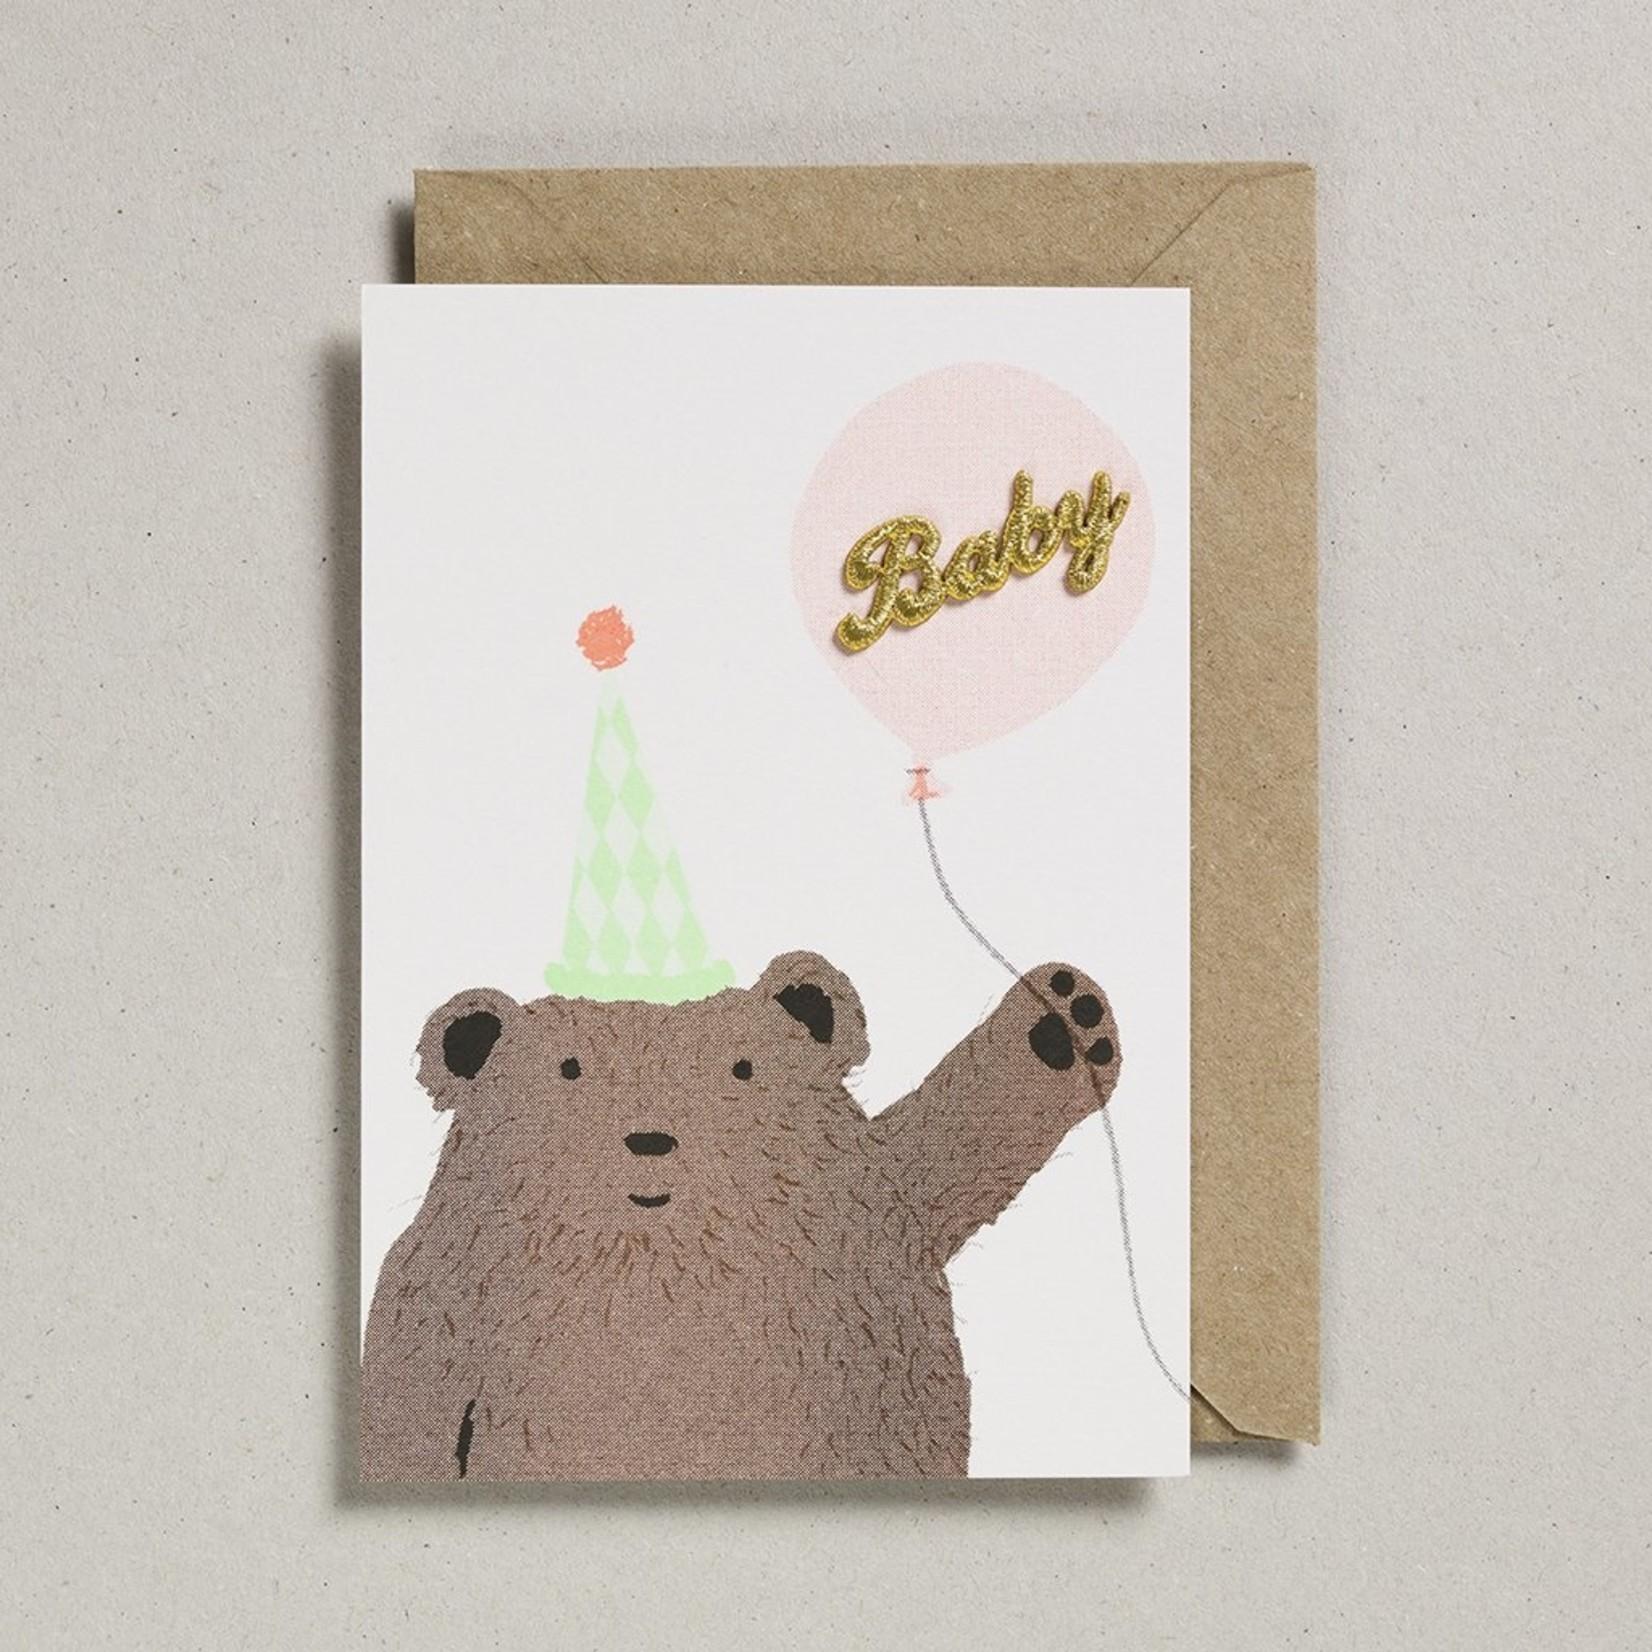 Petra Boase Petra Boase Wenskaart Bear & Balloon